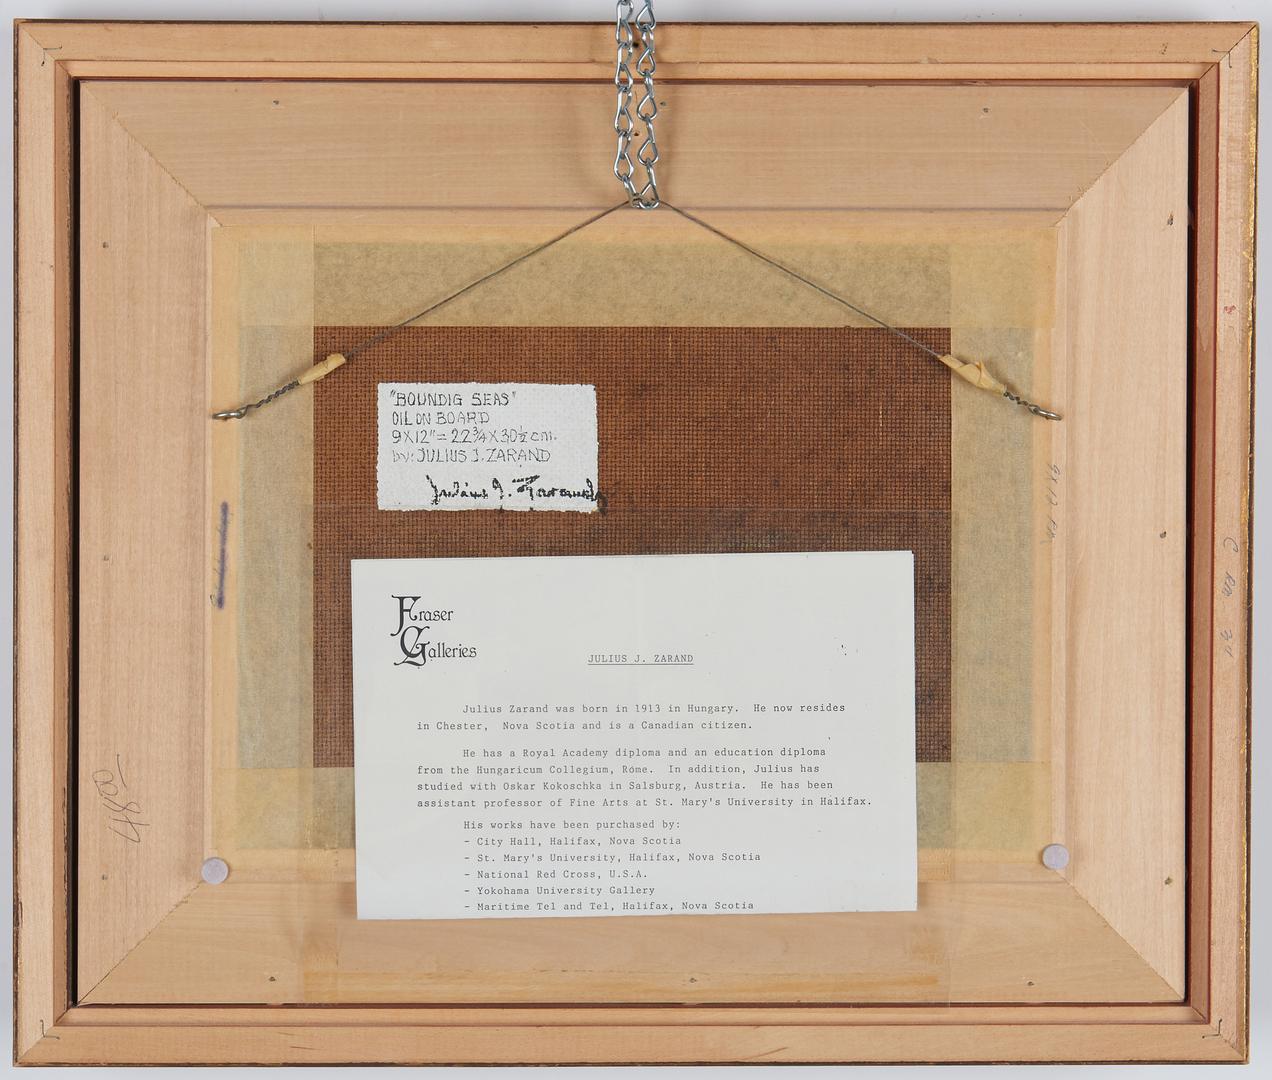 Lot 911: 2 20th Cent. Maritime Paintings, incl. H.H. Ahl, J. Zarand